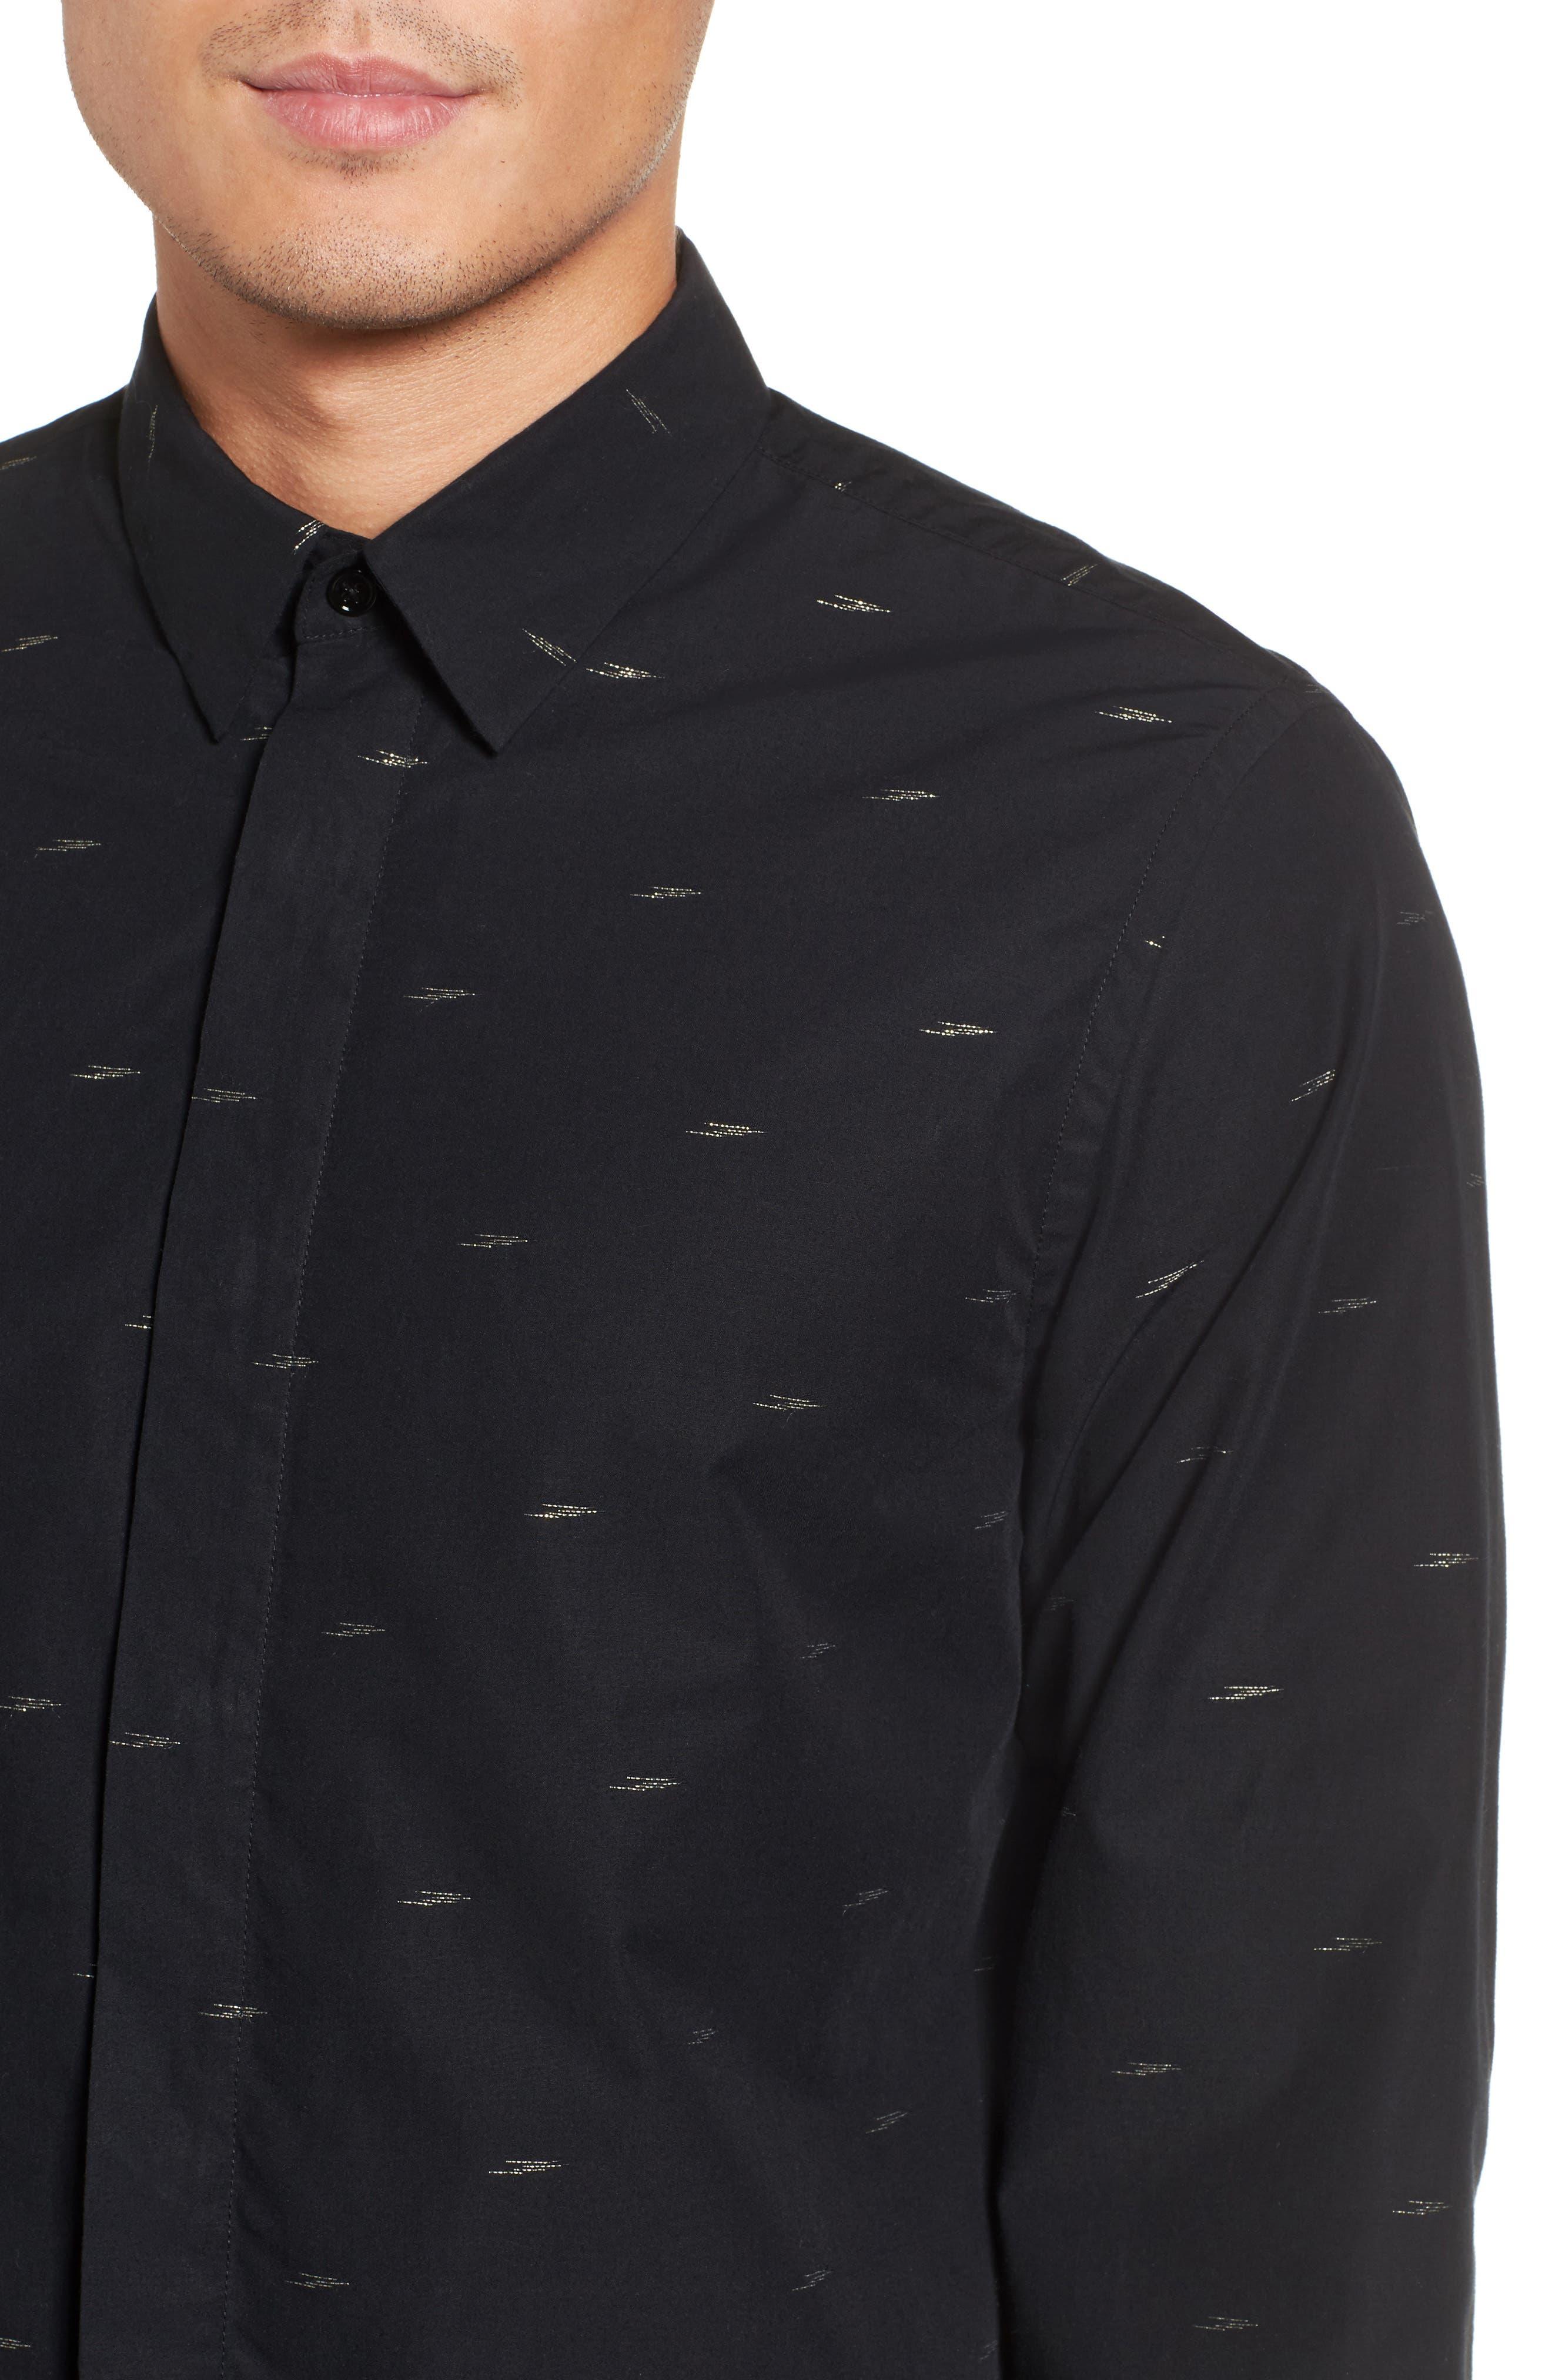 Levy Regular Fit Sport Shirt,                             Alternate thumbnail 4, color,                             001